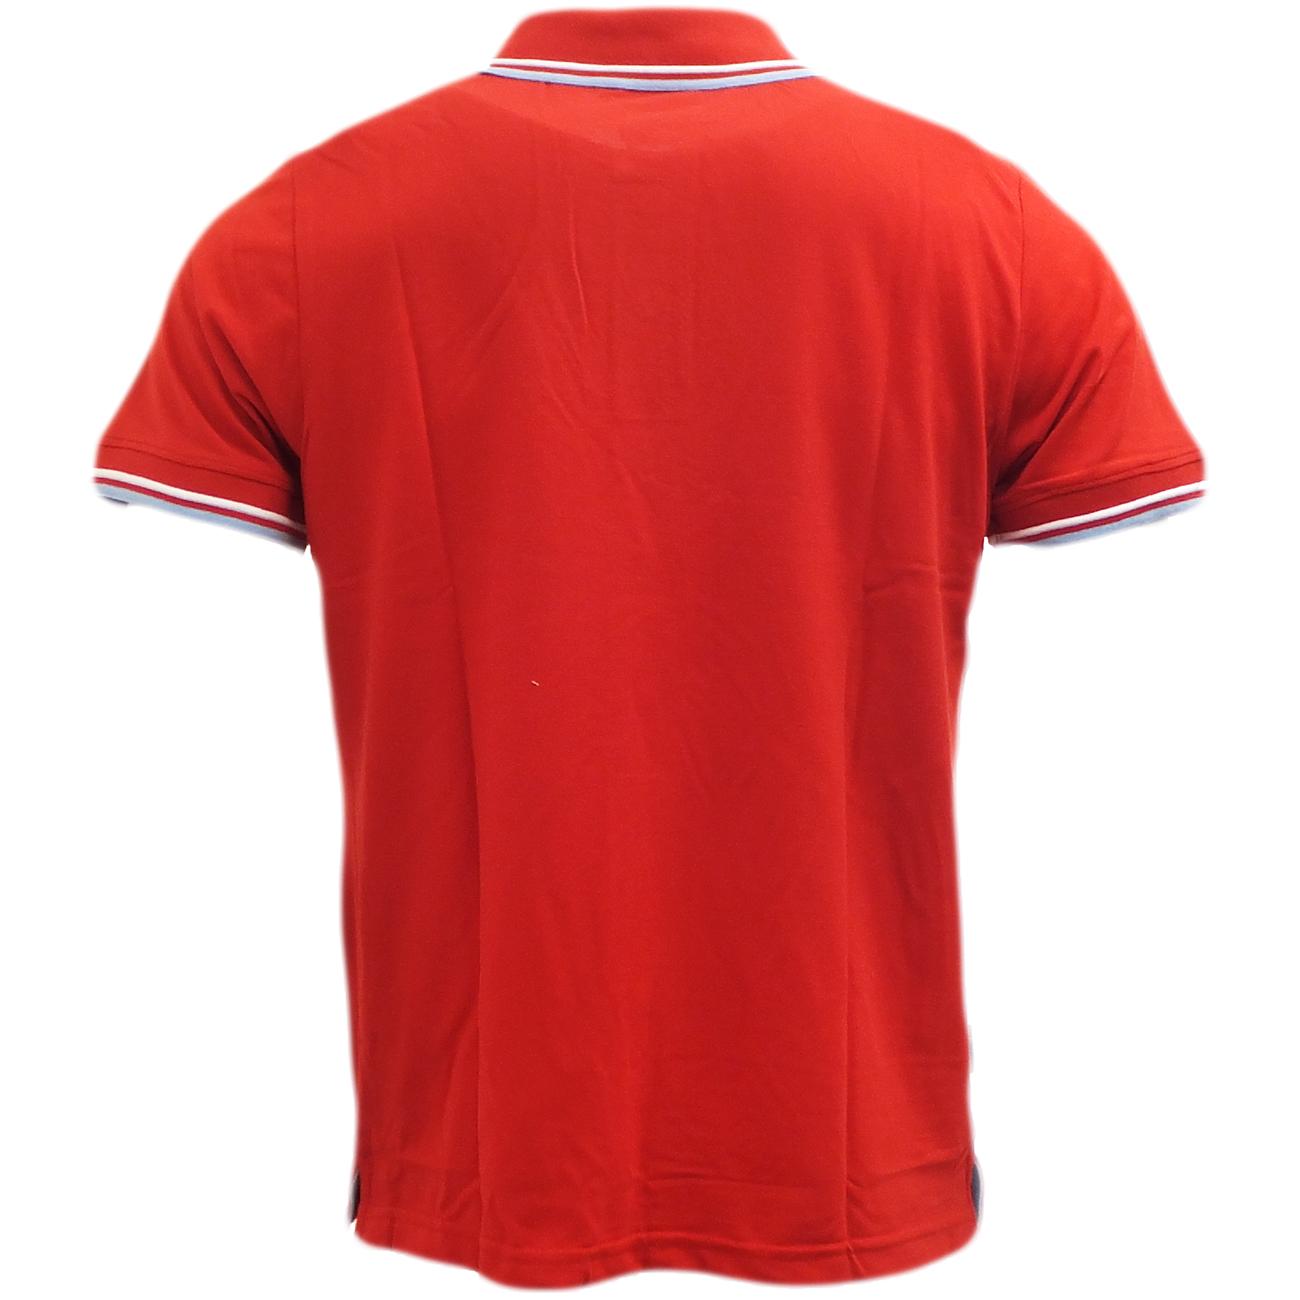 Slazenger Plain Polo Shirt Mens Polos Short Sleeve